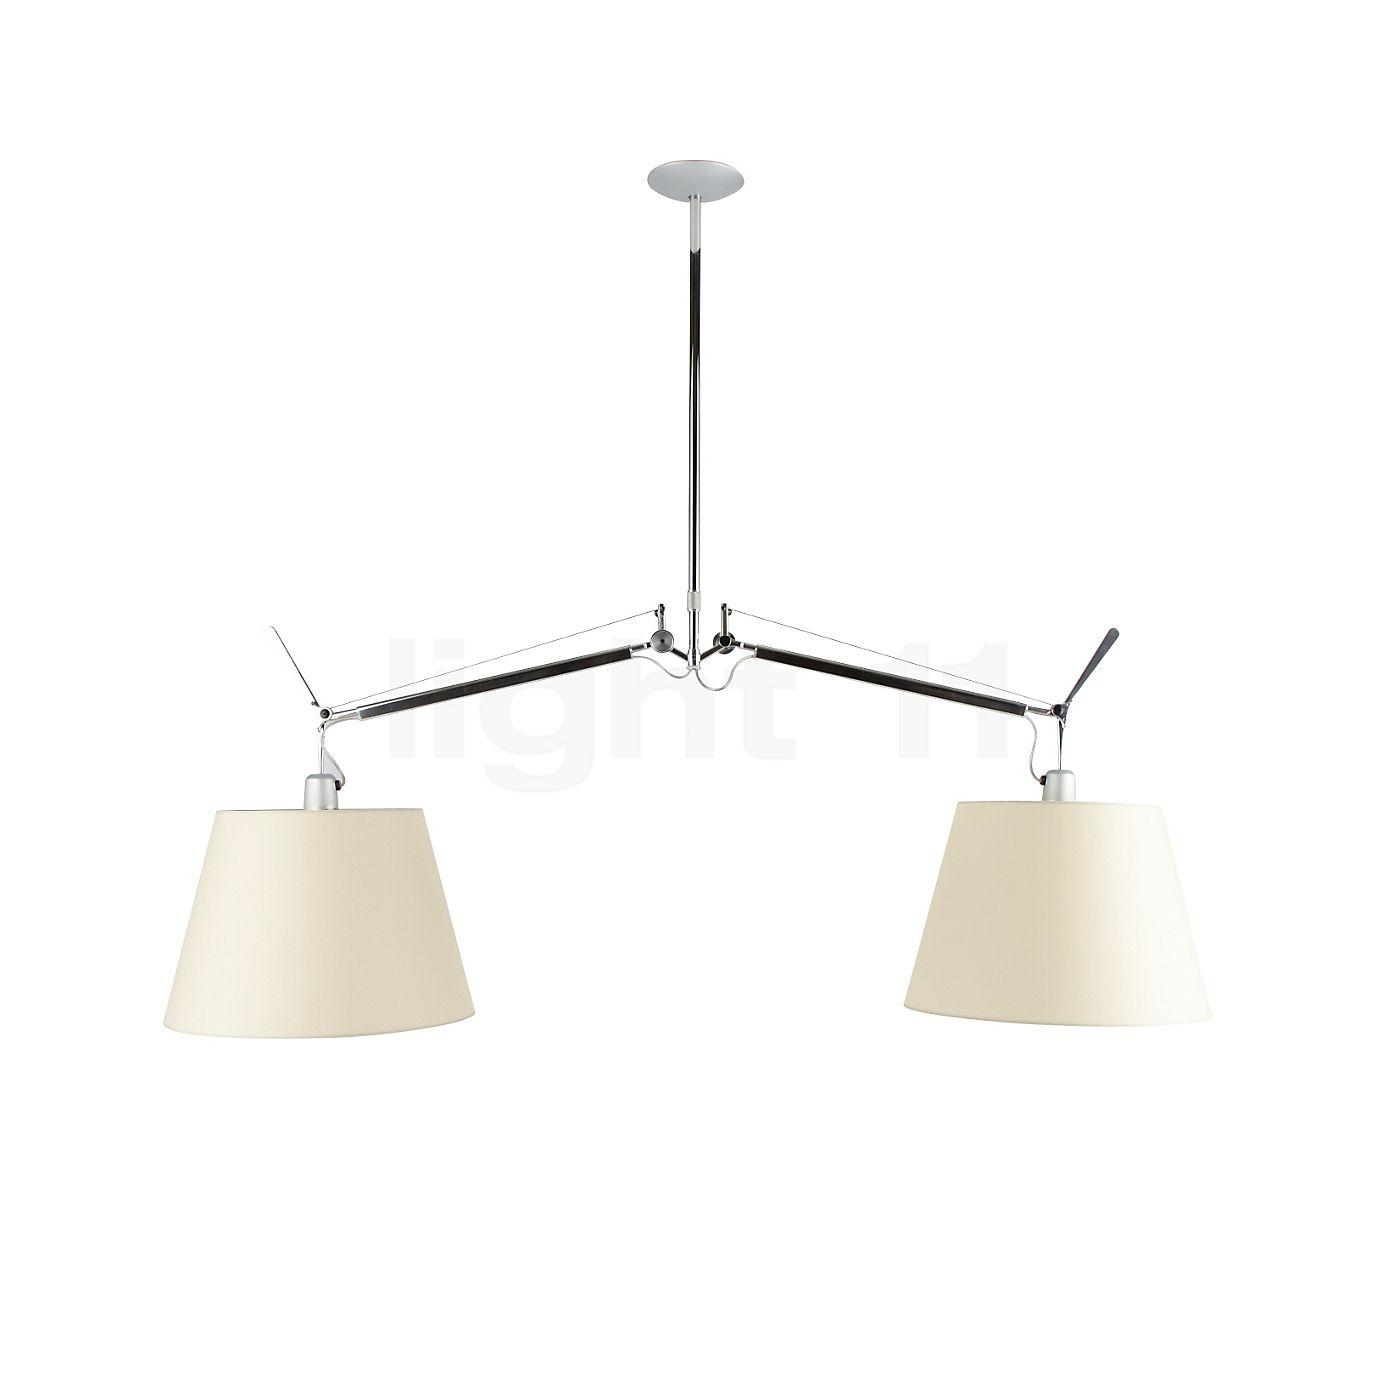 Artemide Tolomeo Sospensione Diffusore Kaufen Bei Light11 De Ceiling Lights Lamp Lights